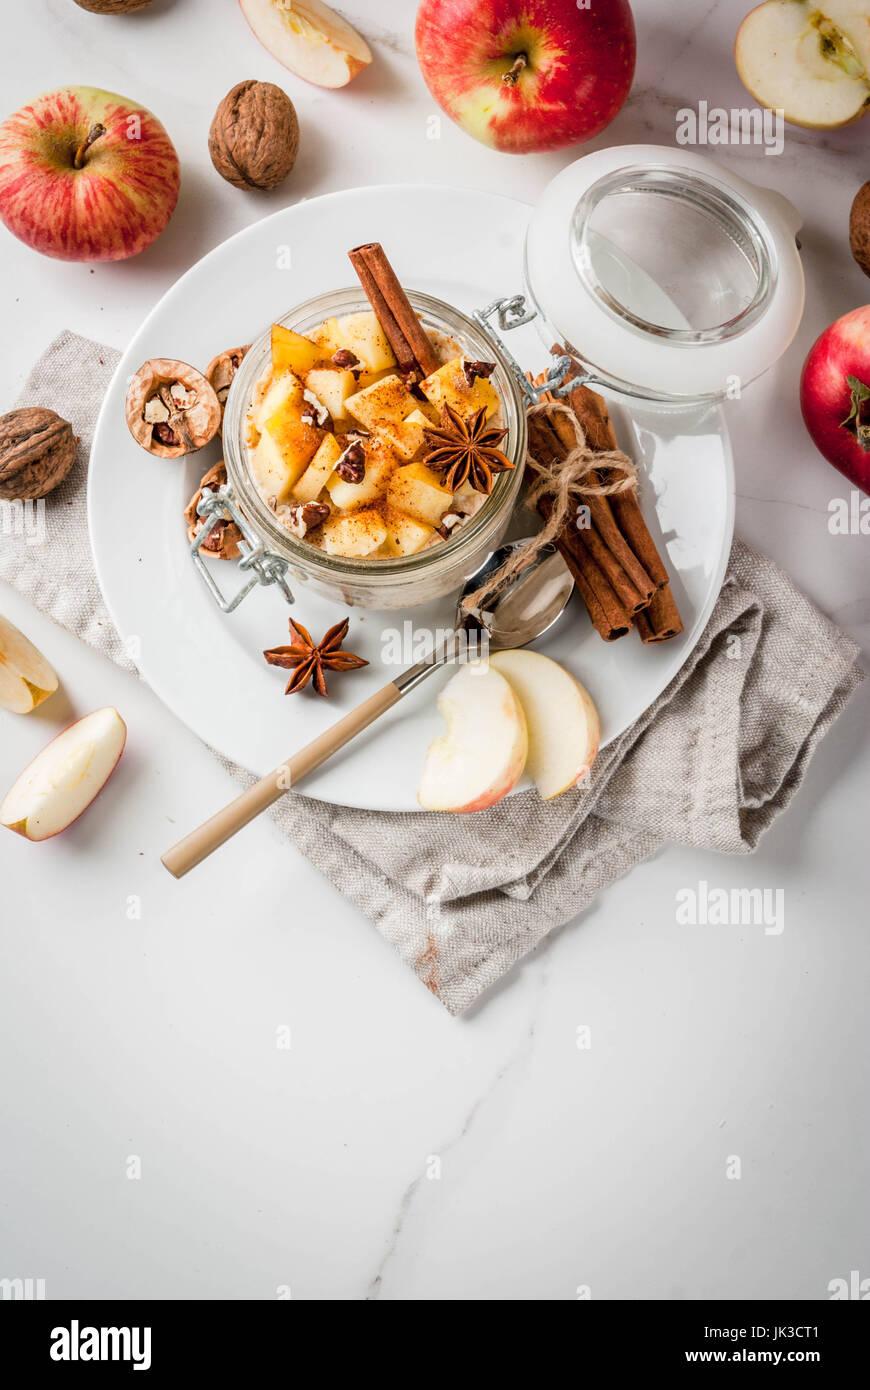 Healthy vegan food. Dietary breakfast or snack. Apple pie overnight oats, with apples, yogurt, cinnamon, spices, - Stock Image